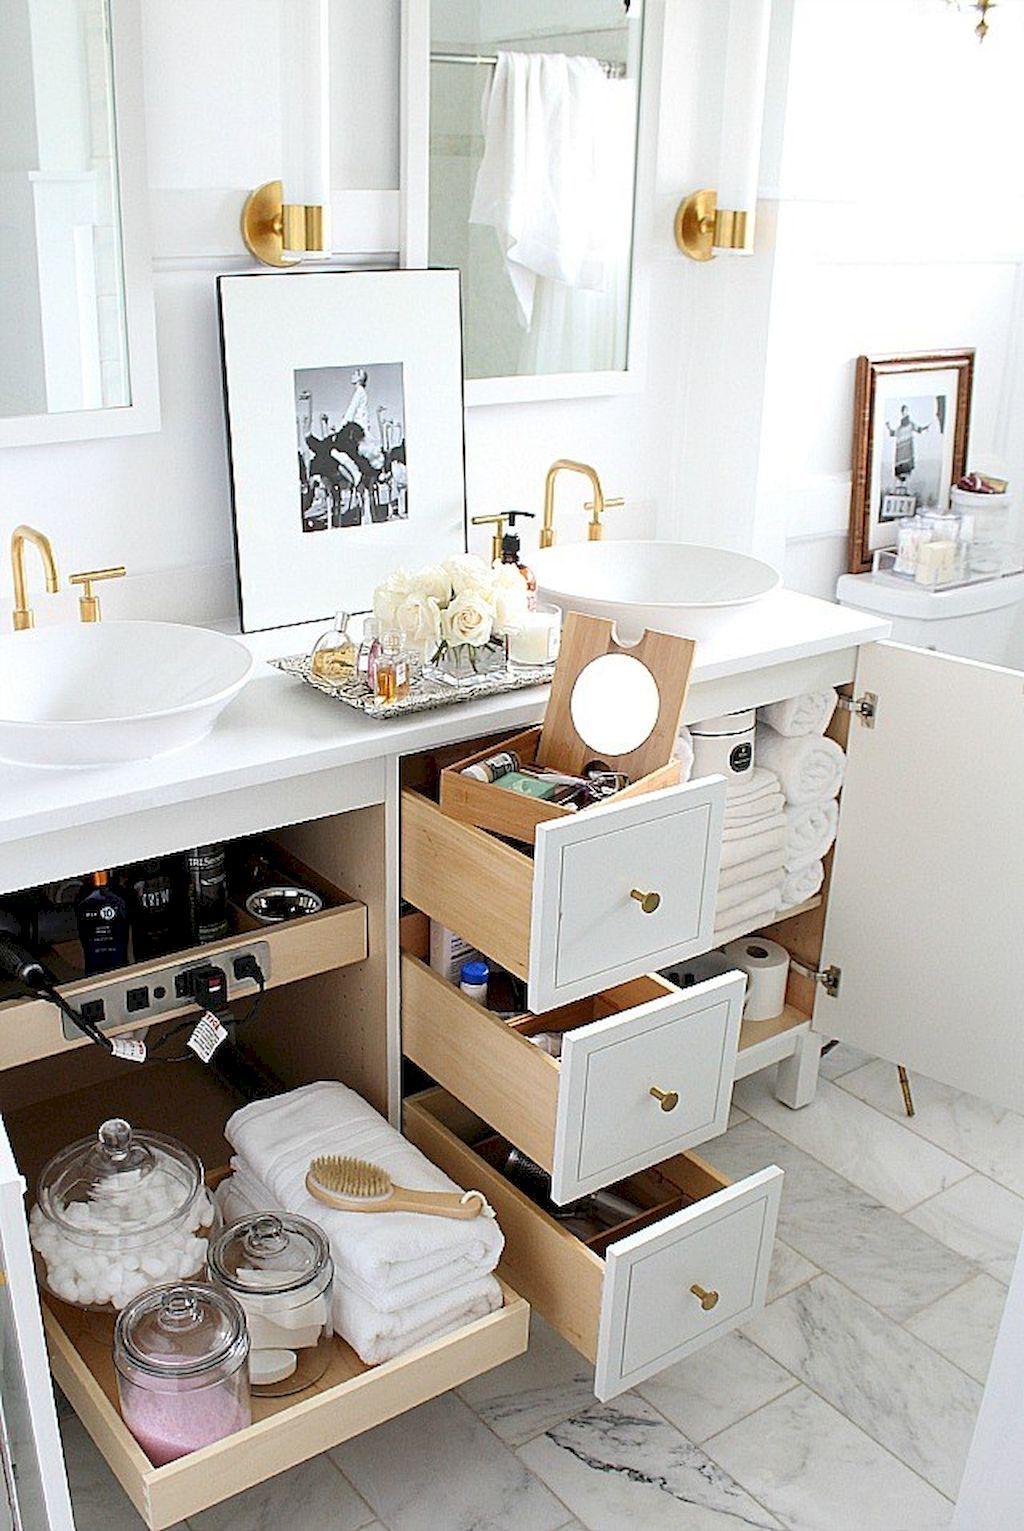 79 Functional Small Bathroom Organization Ideas  Bathroom Awesome Small Bathroom Organization Decorating Inspiration